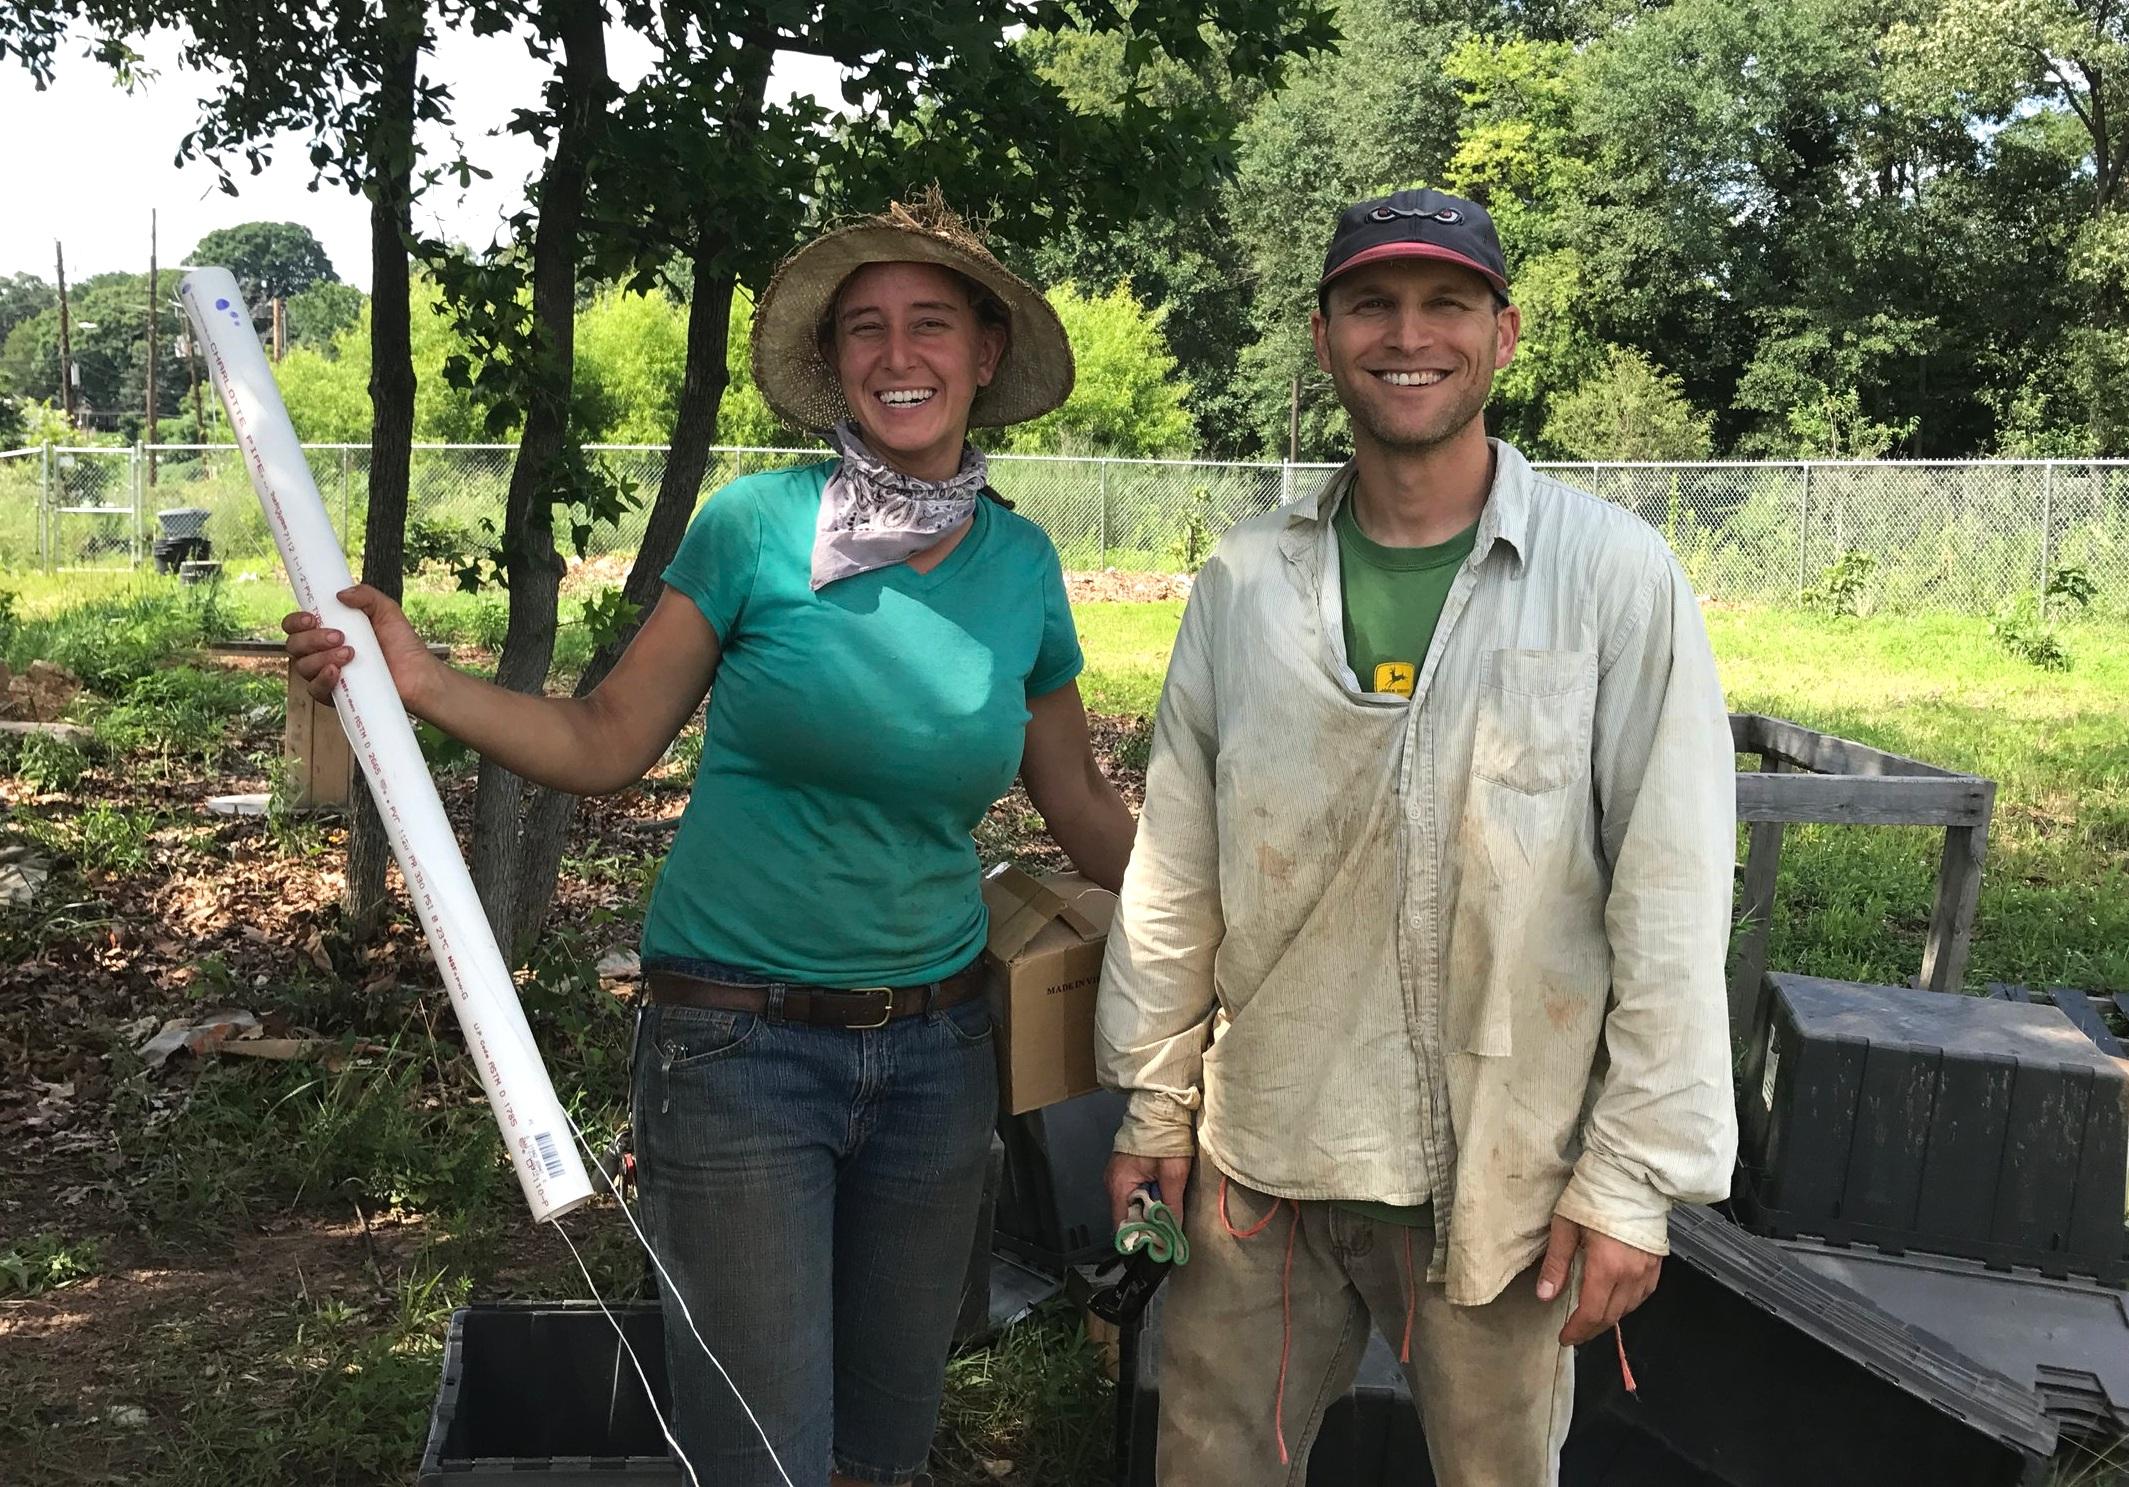 Andrea Ness and Andy Freidburg, owners of Aluma Farms